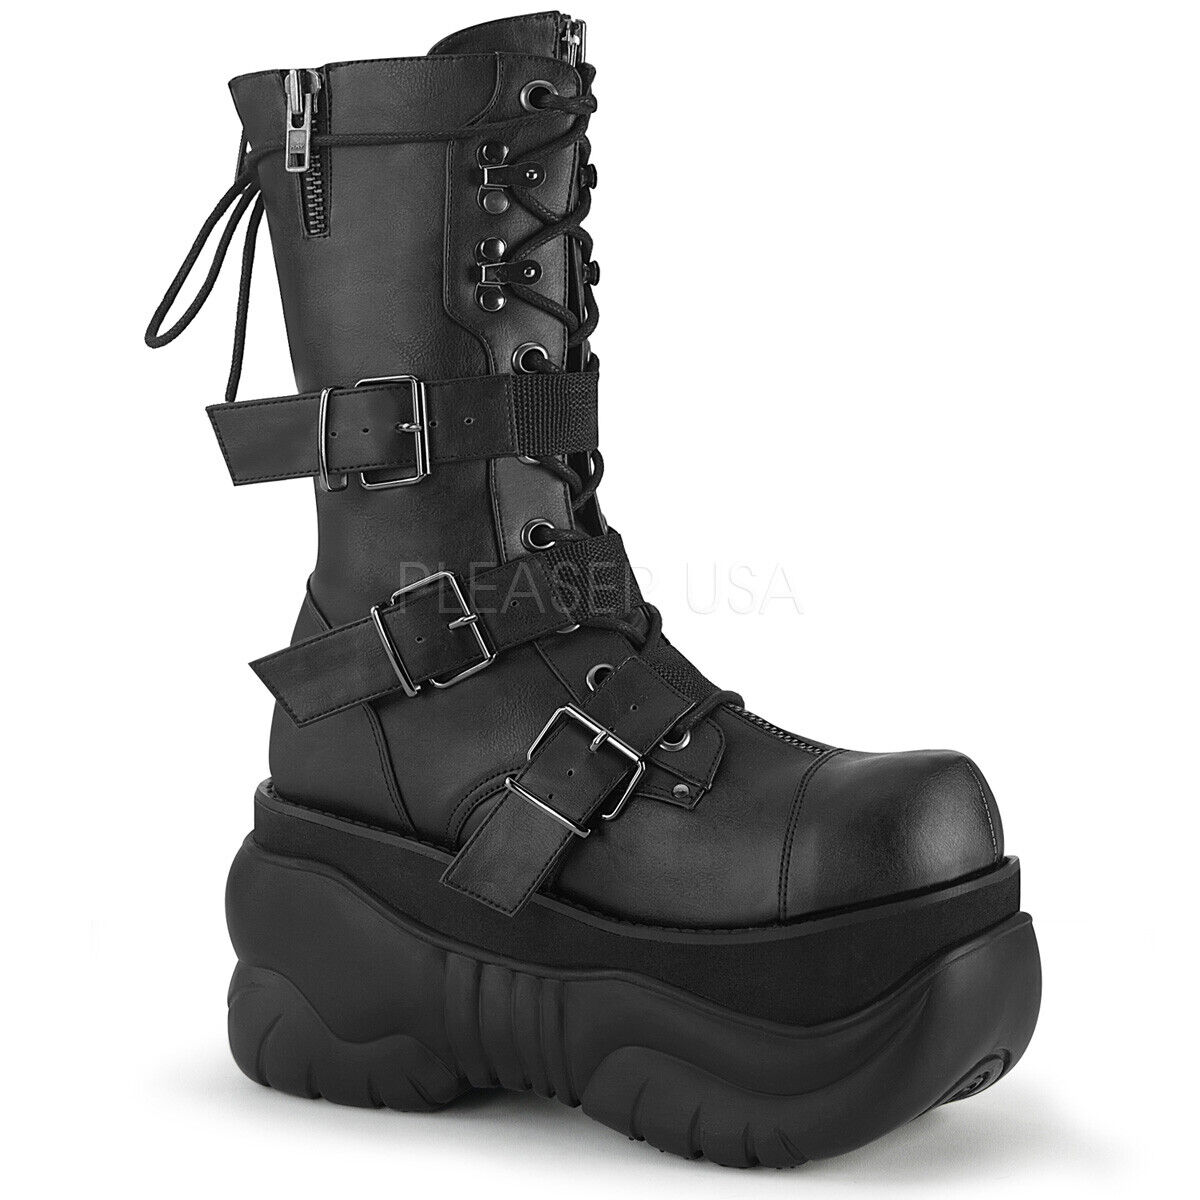 Demonia BOXER-230 Men's Black Vegan Leather Platform Lace-Up Zip Mid Calf Boots